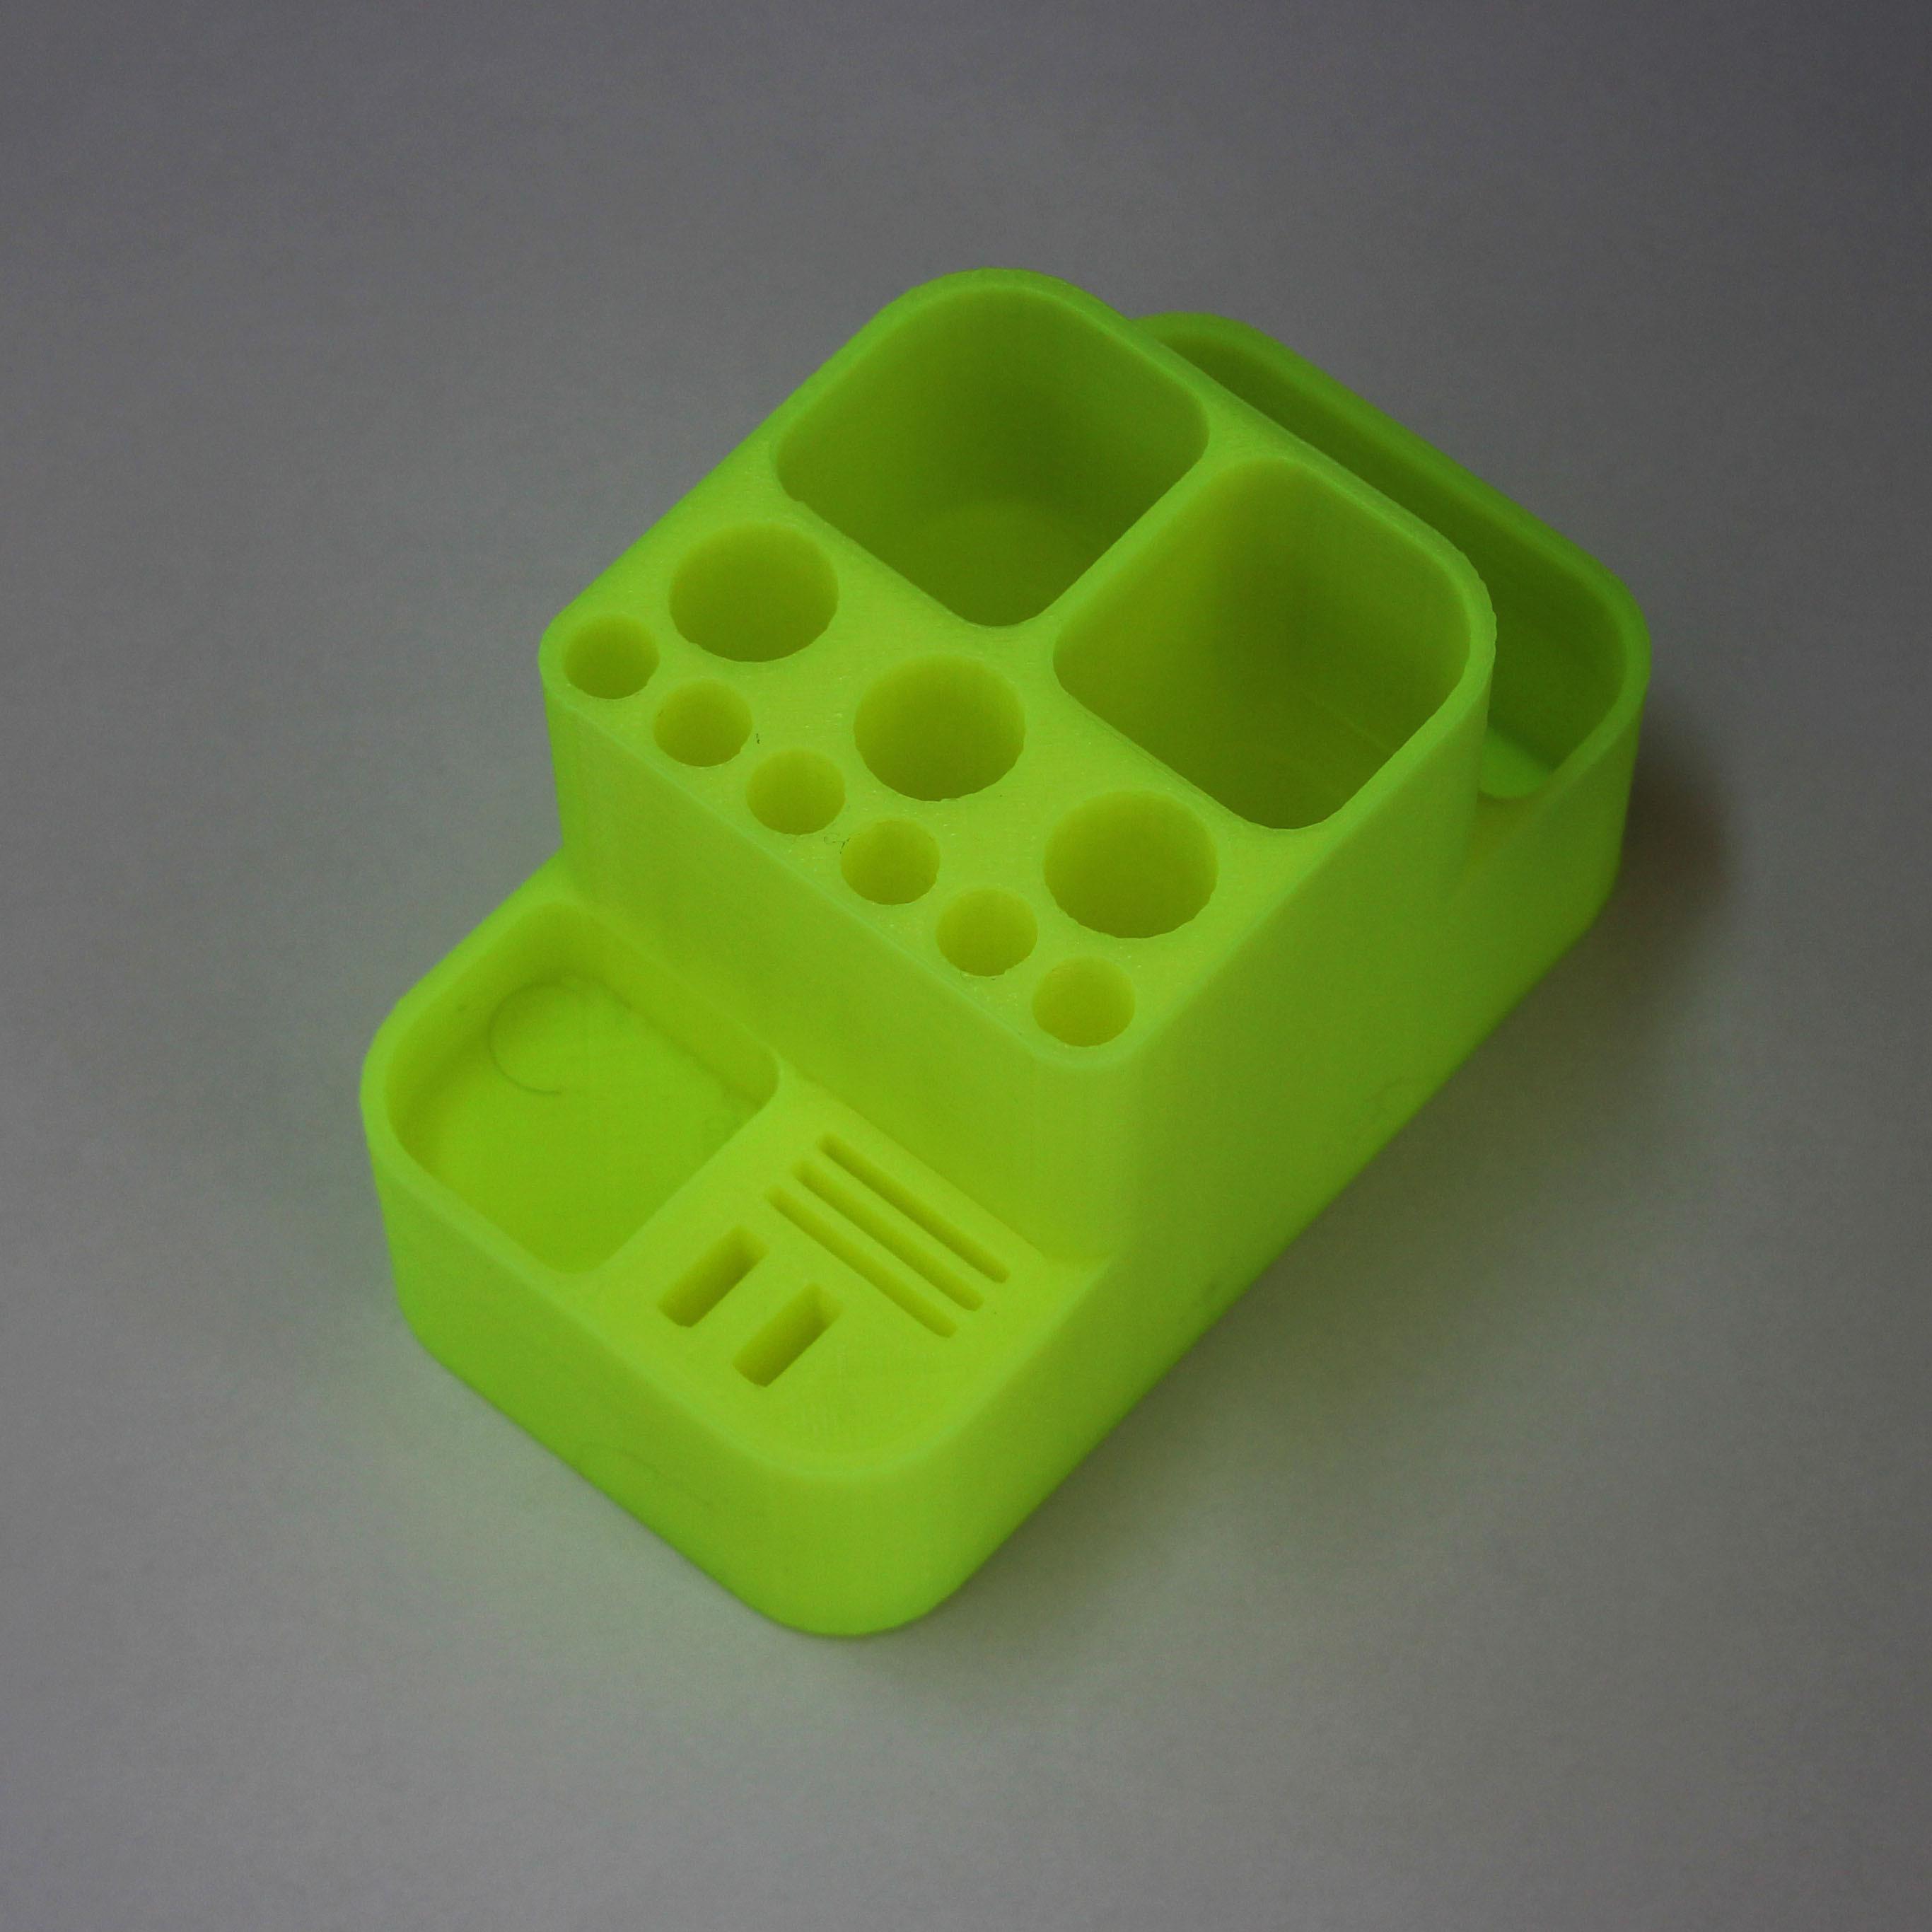 Office_material_holder__2_.JPG Download free STL file Office material holder • 3D printing object, BEEVERYCREATIVE